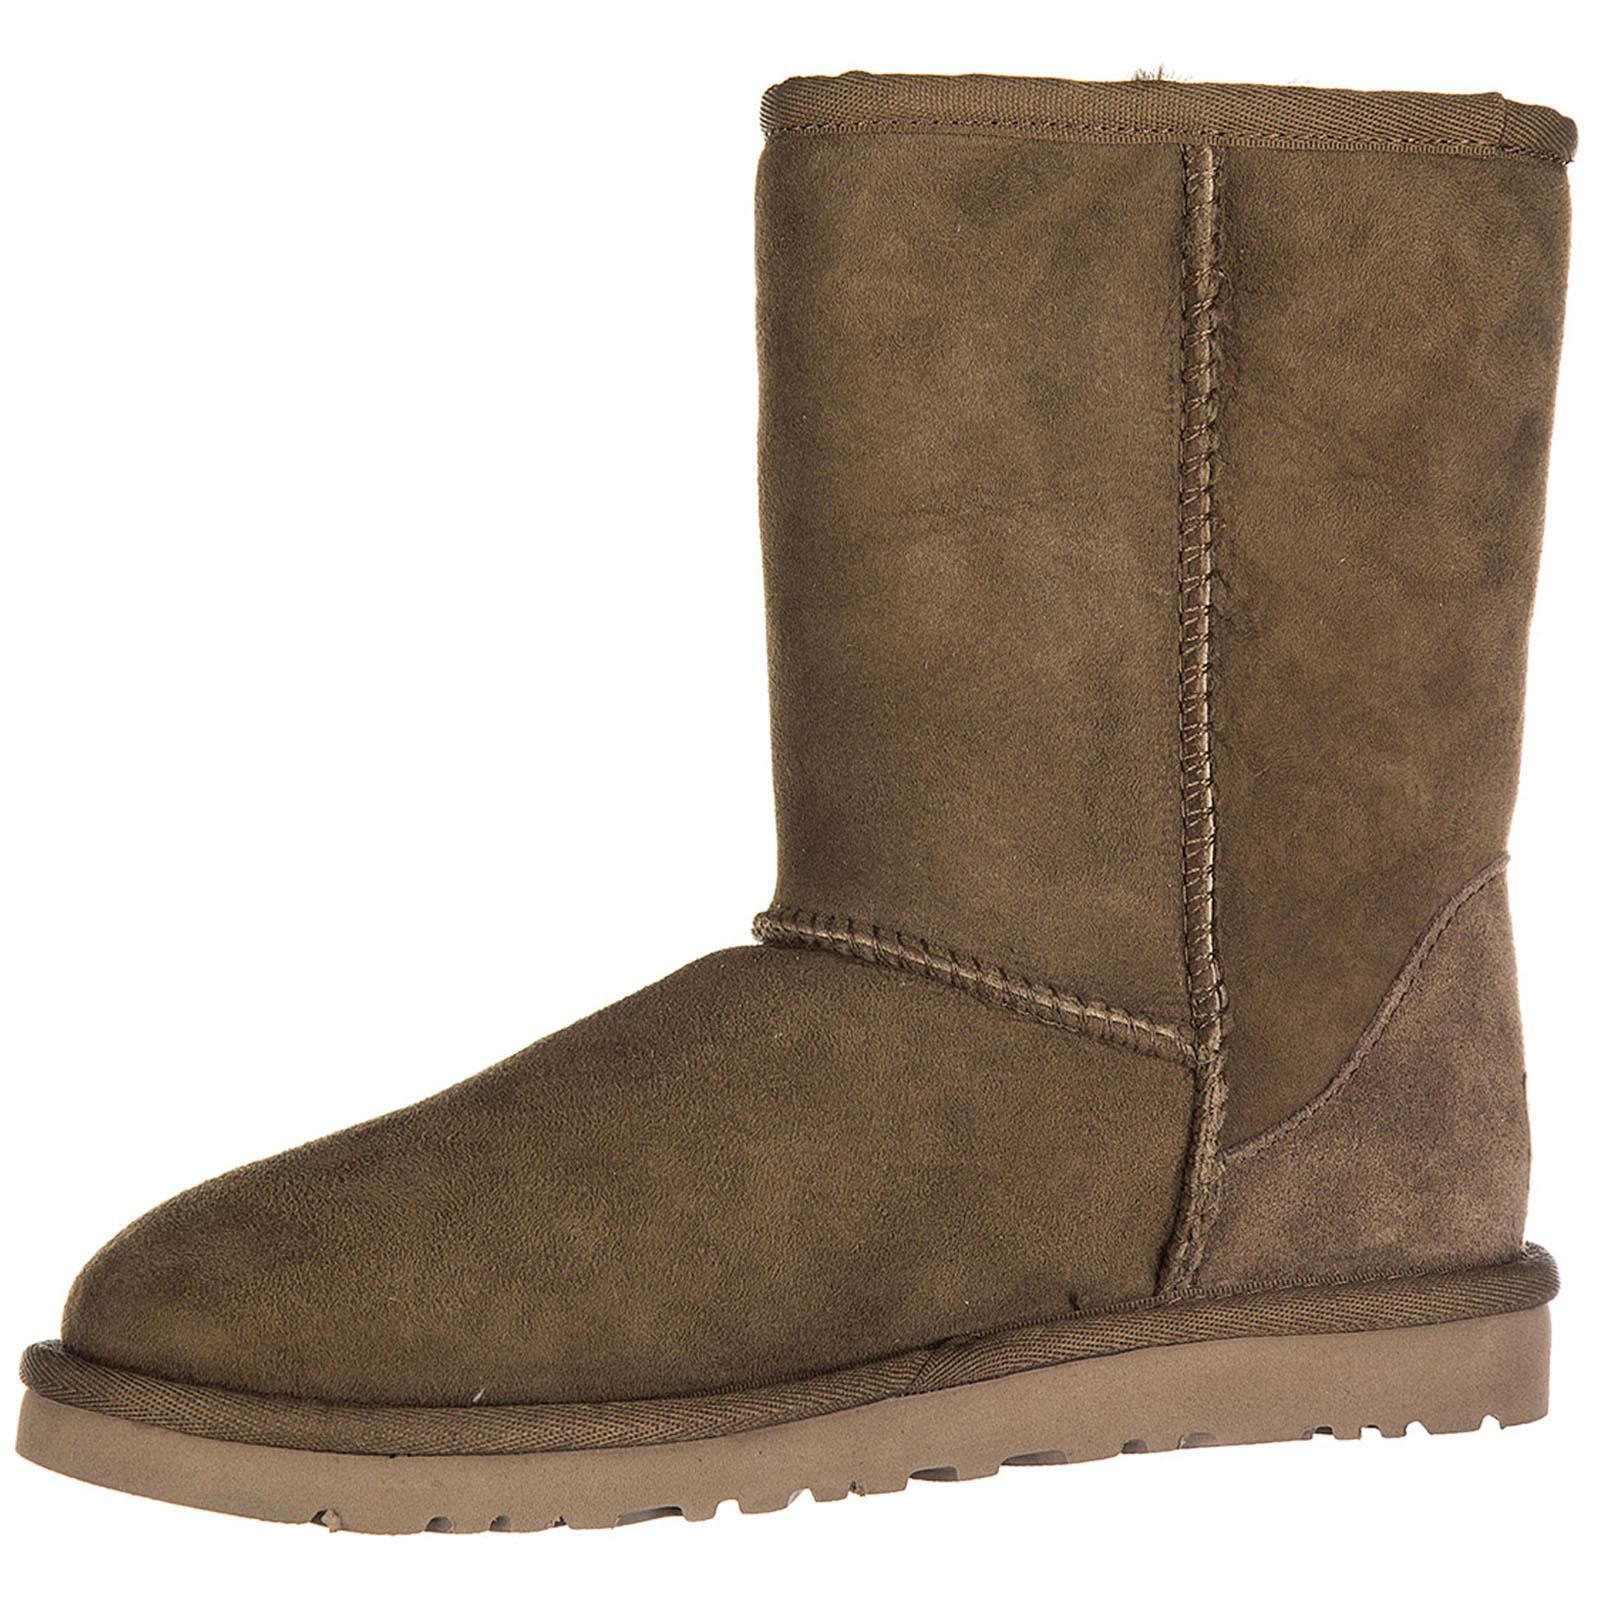 Damen wildleder stiefeletten stiefel ankle boots w classic short